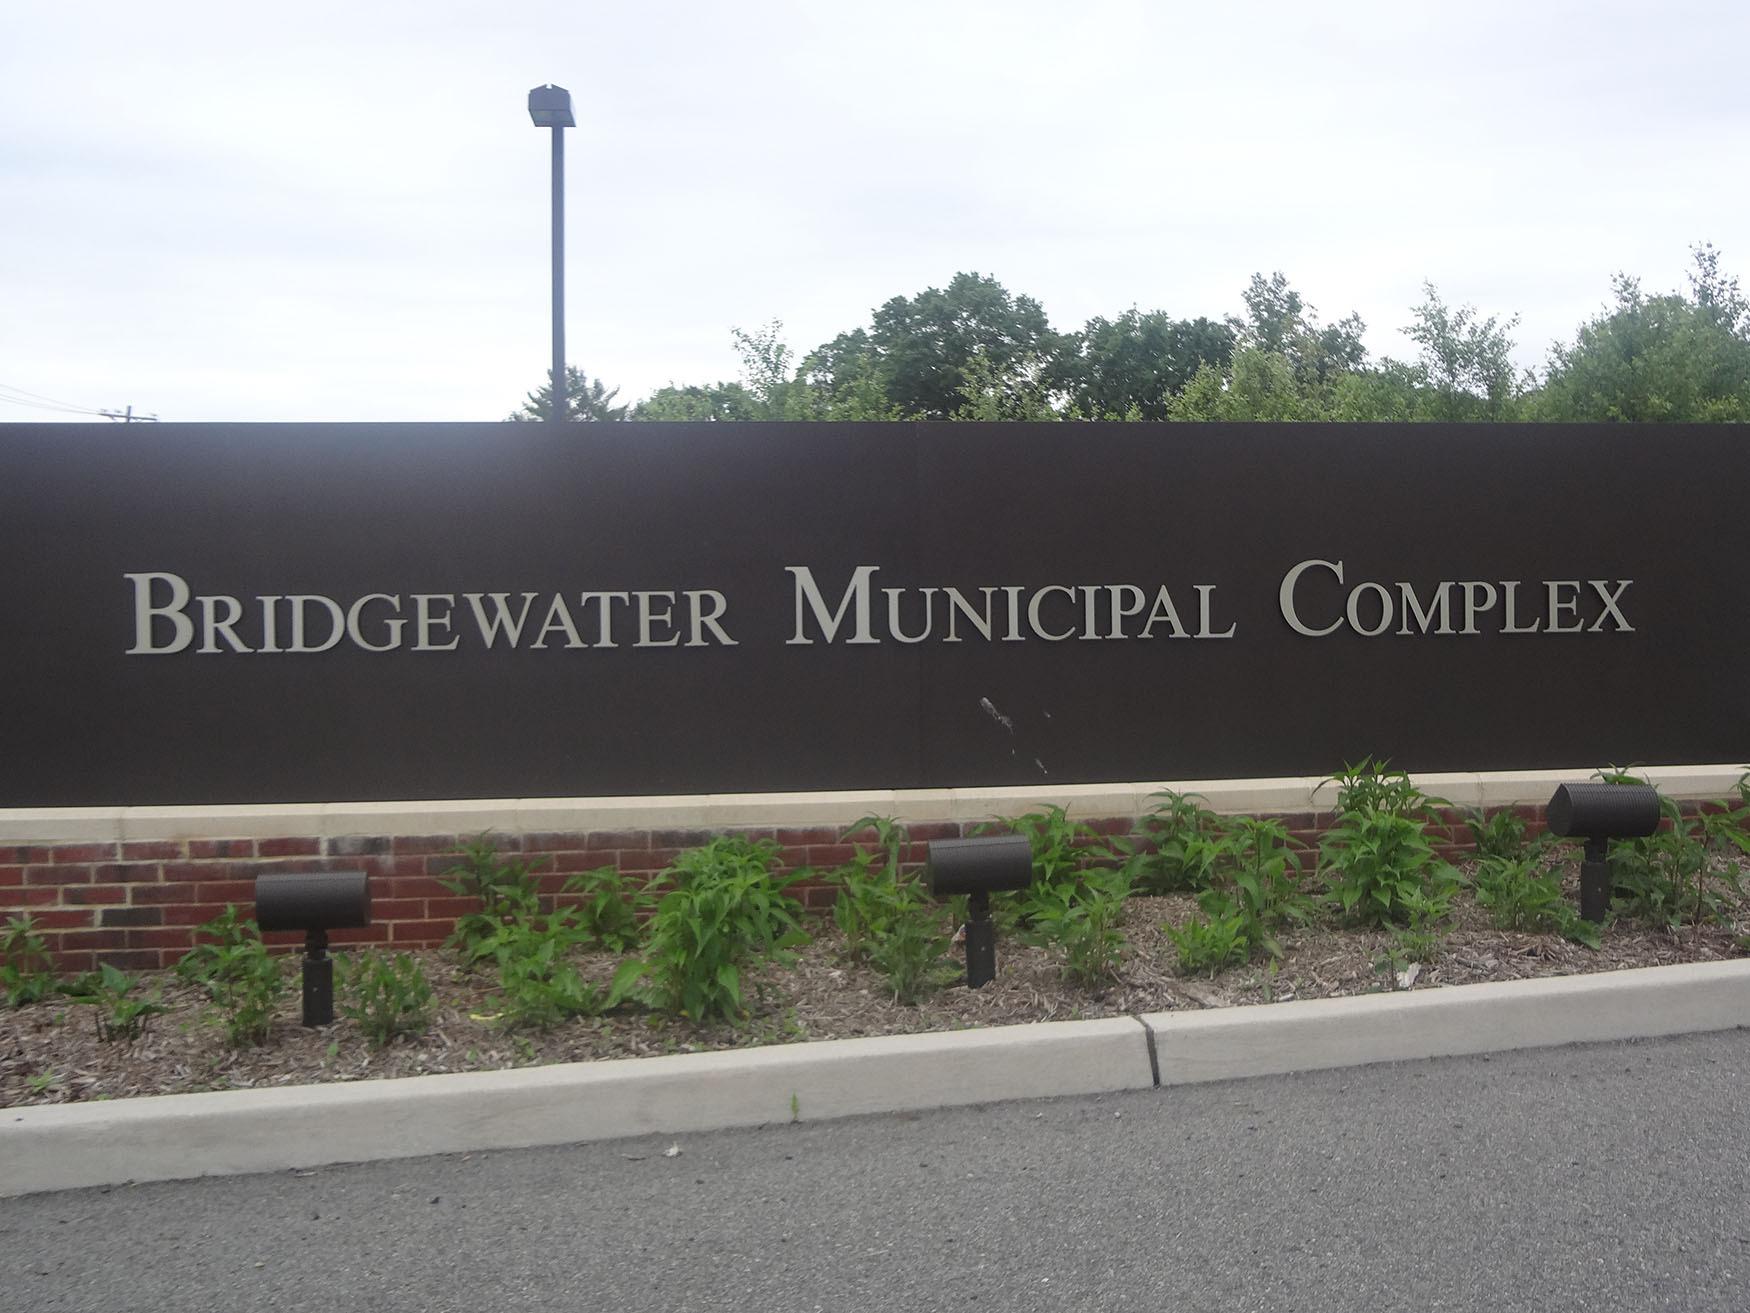 91a1f4c2369acfcfdda5_Bridgewater_municipal.jpg